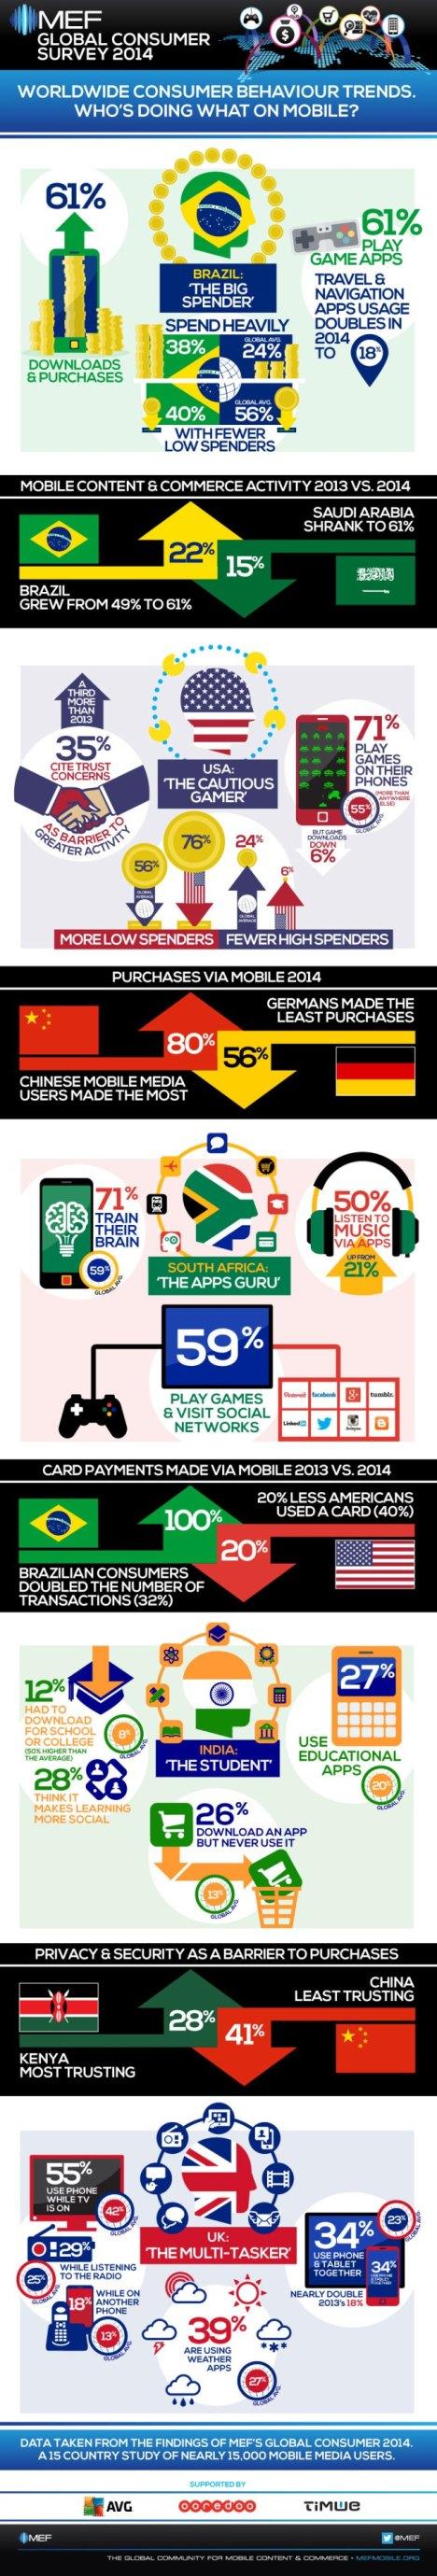 mgcs14_infographic1